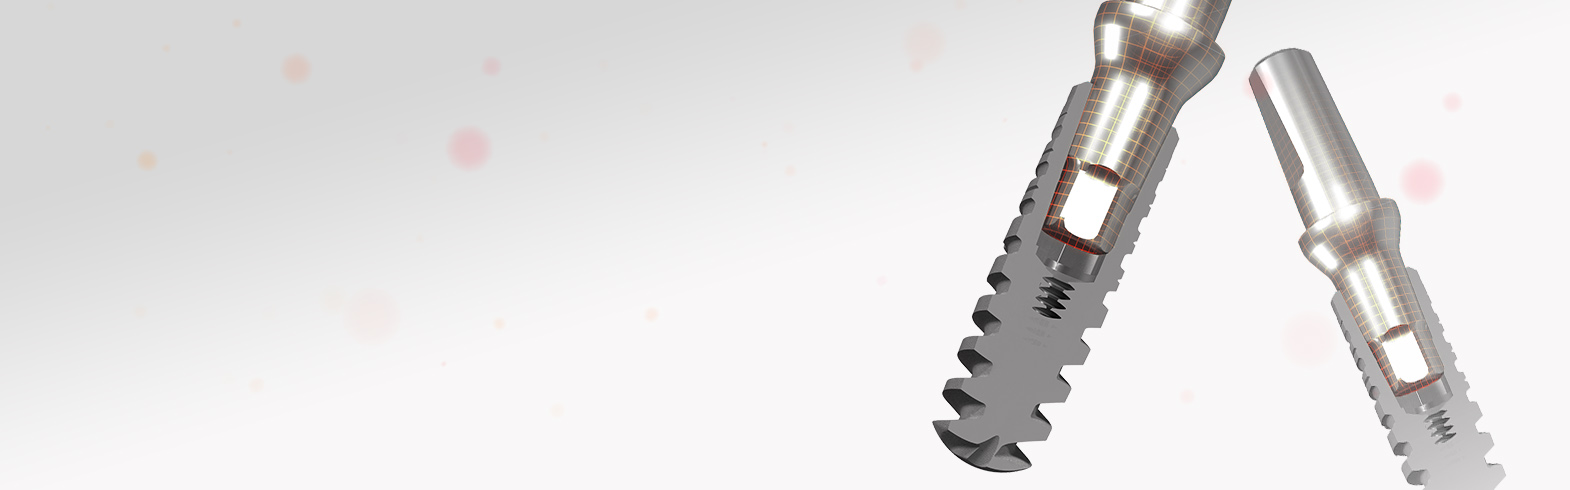 Impianto 3.0_Transfert Protesici